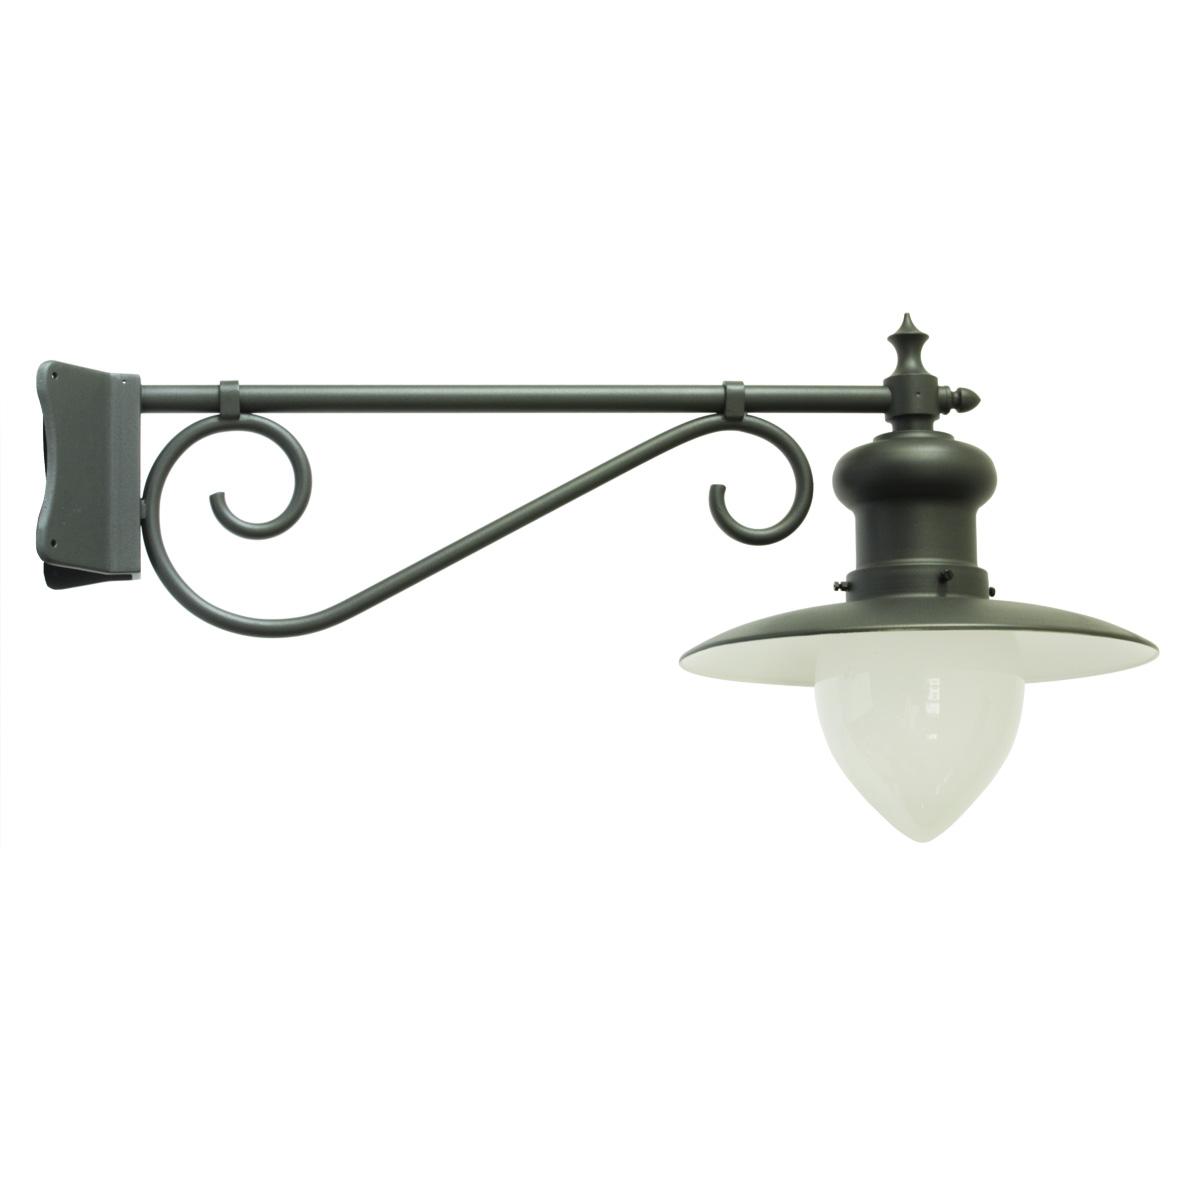 wandlampe mit arm latest wandleuchte chloe mit arm with wandlampe mit arm cheap house doctor. Black Bedroom Furniture Sets. Home Design Ideas